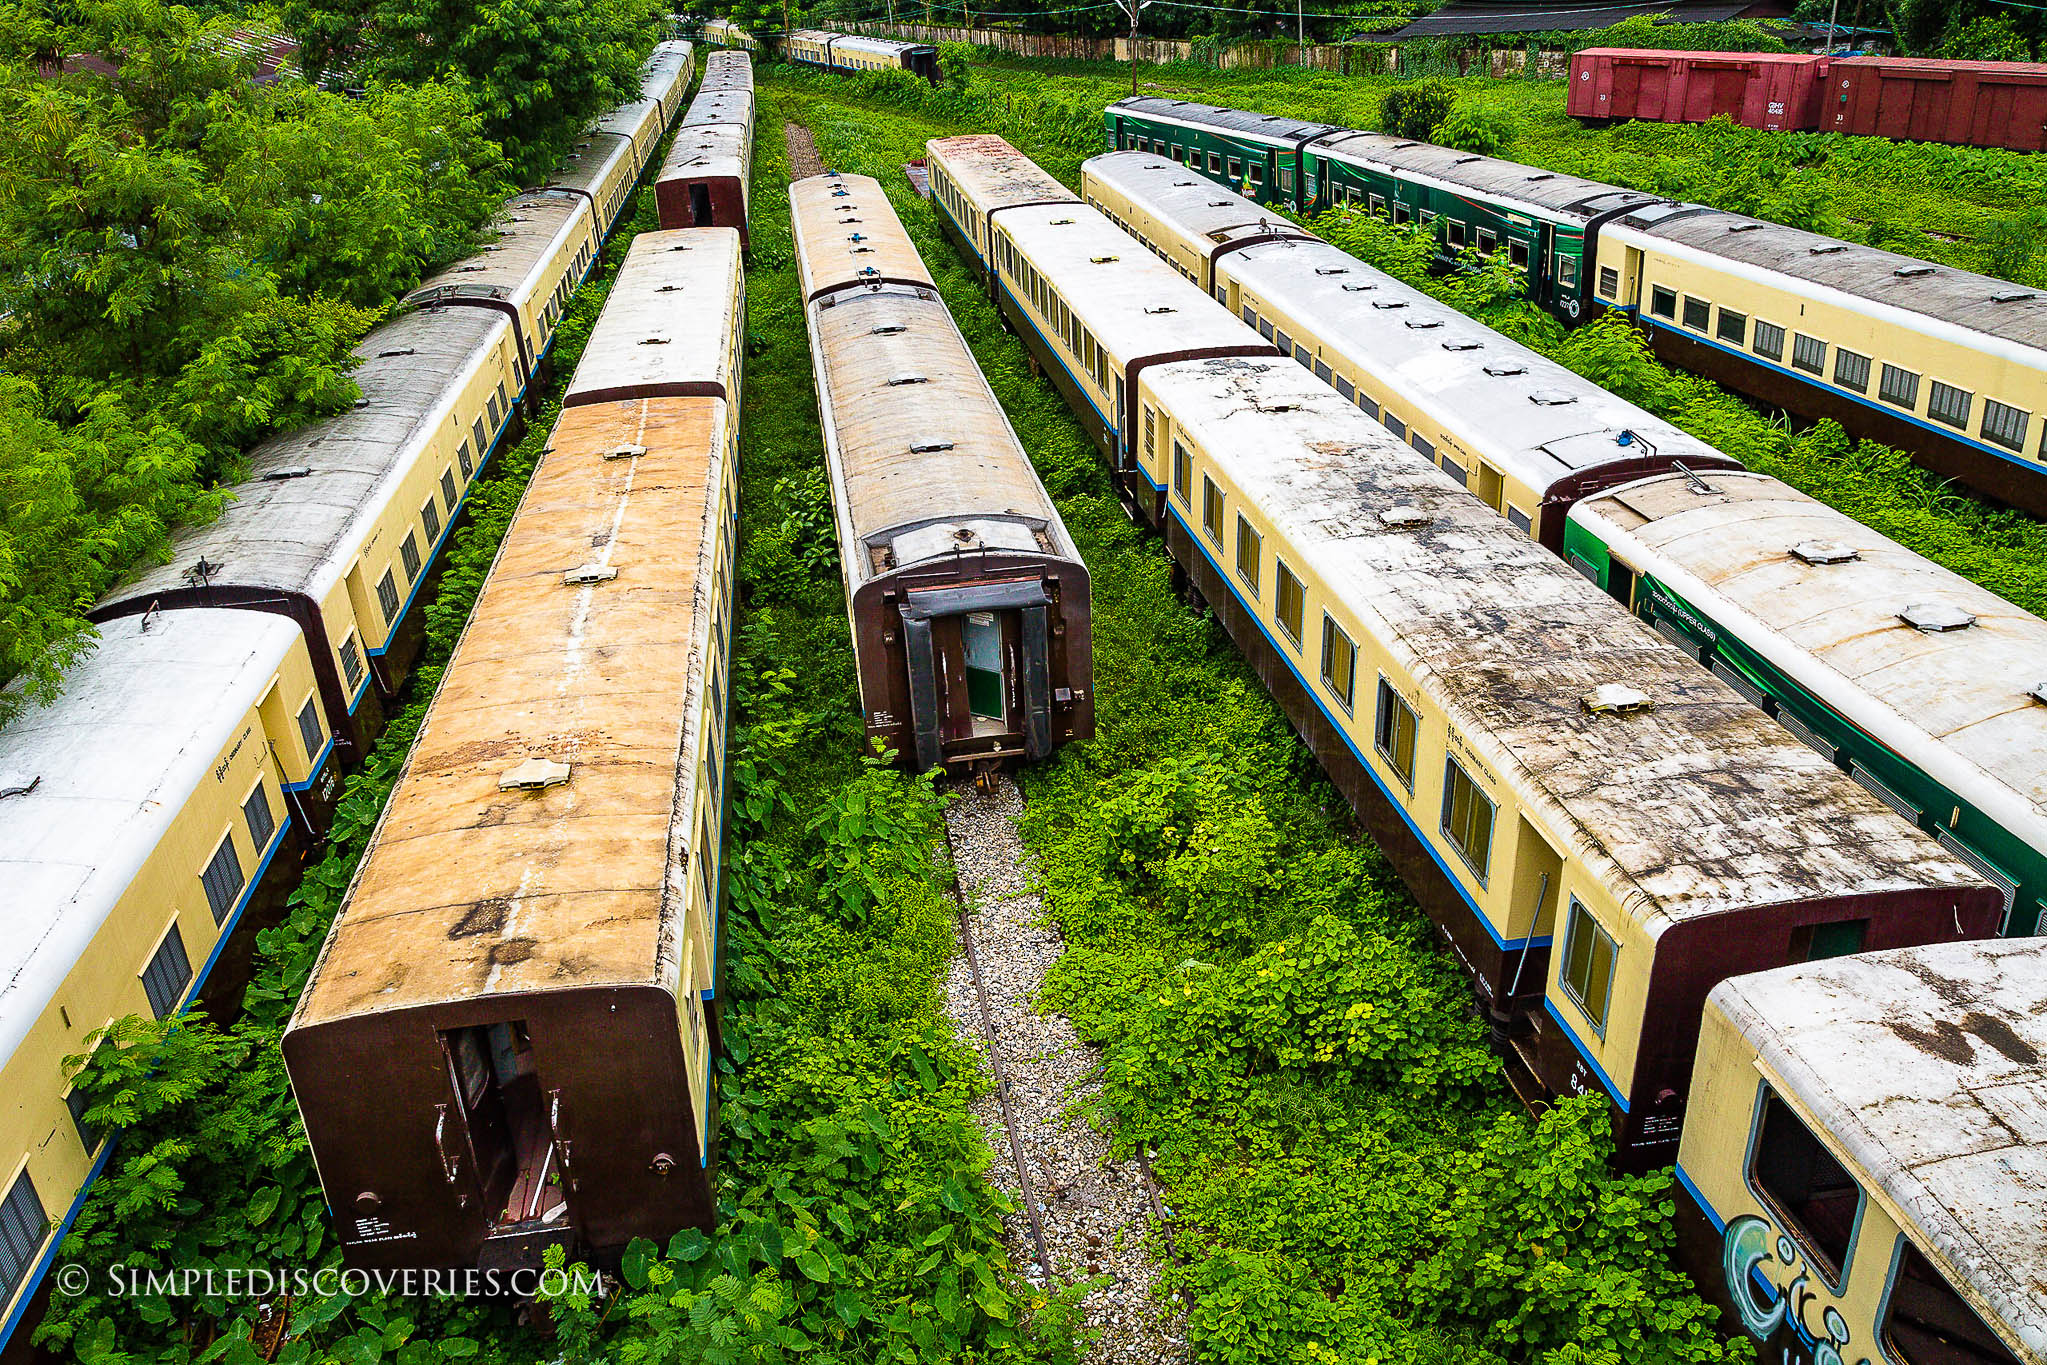 yangon_myanmar_train_yard